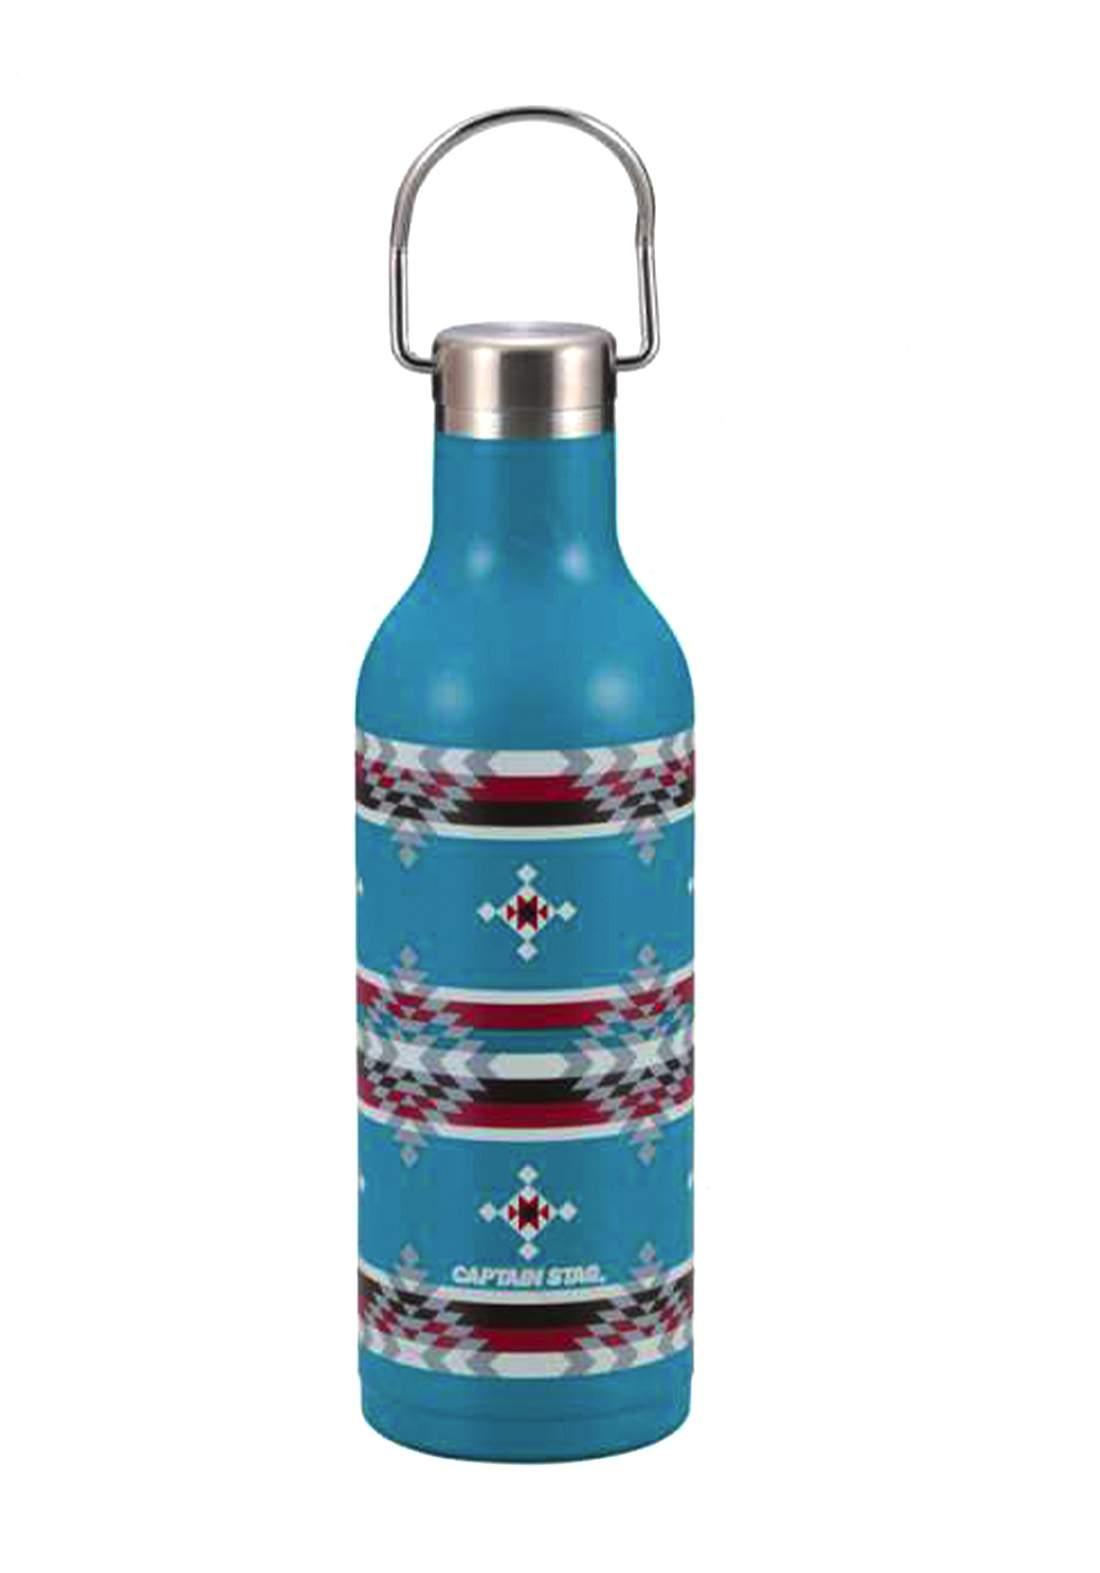 Captain Stag UE-3464 Native Hanger Bottle 480ml Blue UE-3464 ترمس حراري